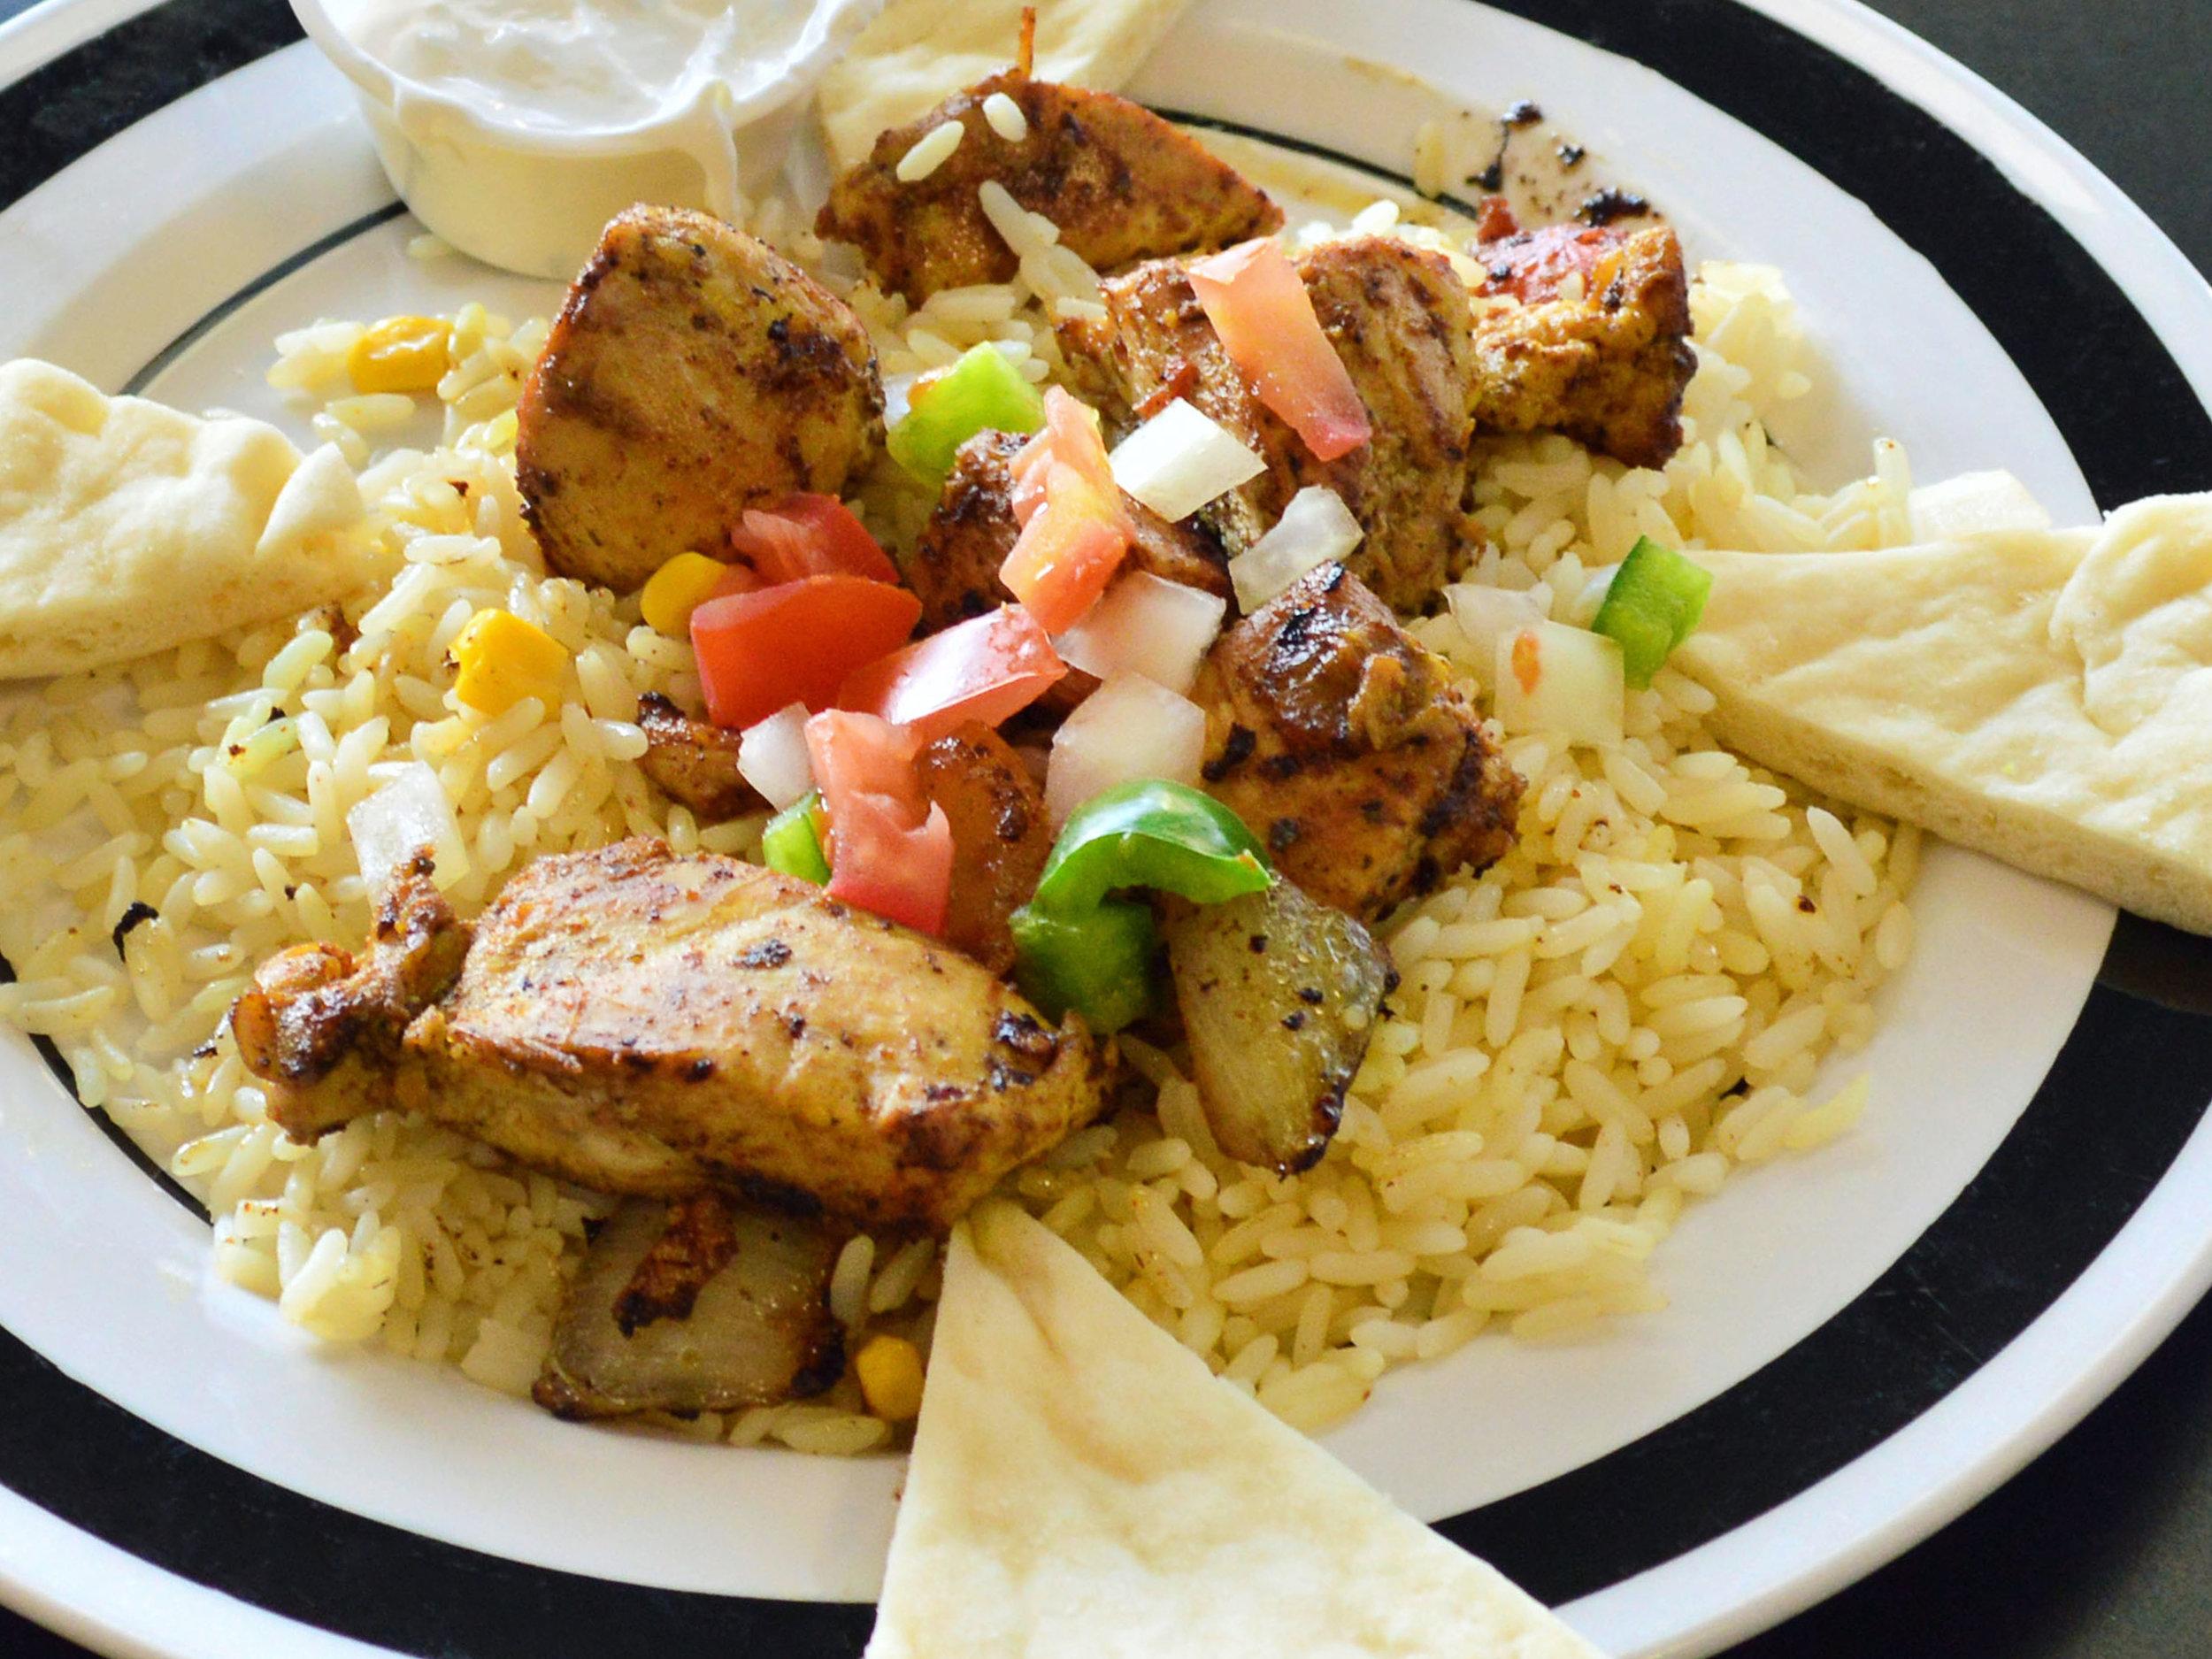 LucieMonroe'sMediterraneanCafe_ChickenShawarma_3_option2.jpg